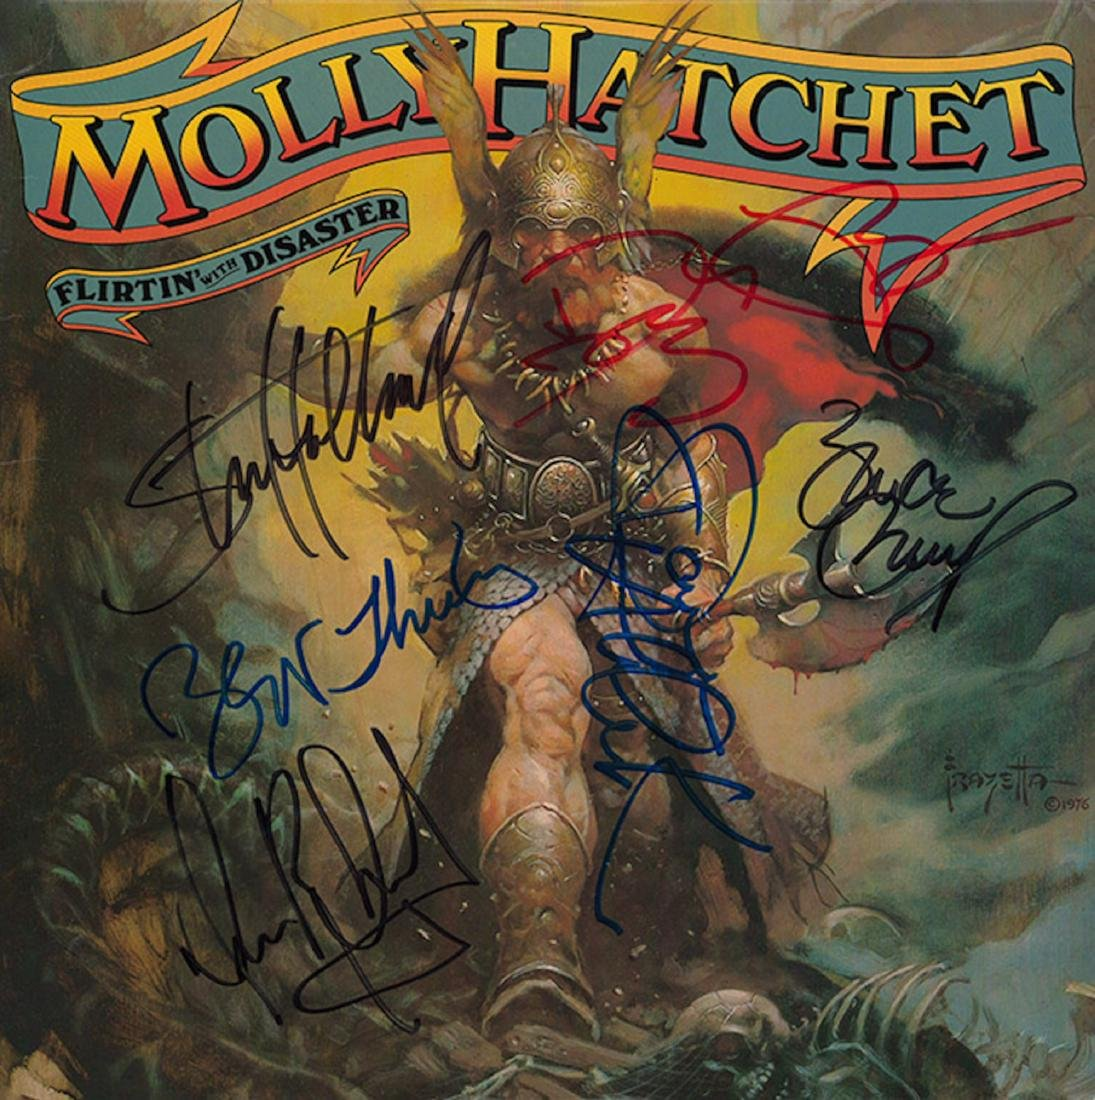 Signed Molly Hatchett Flirtin' With Disaster Album